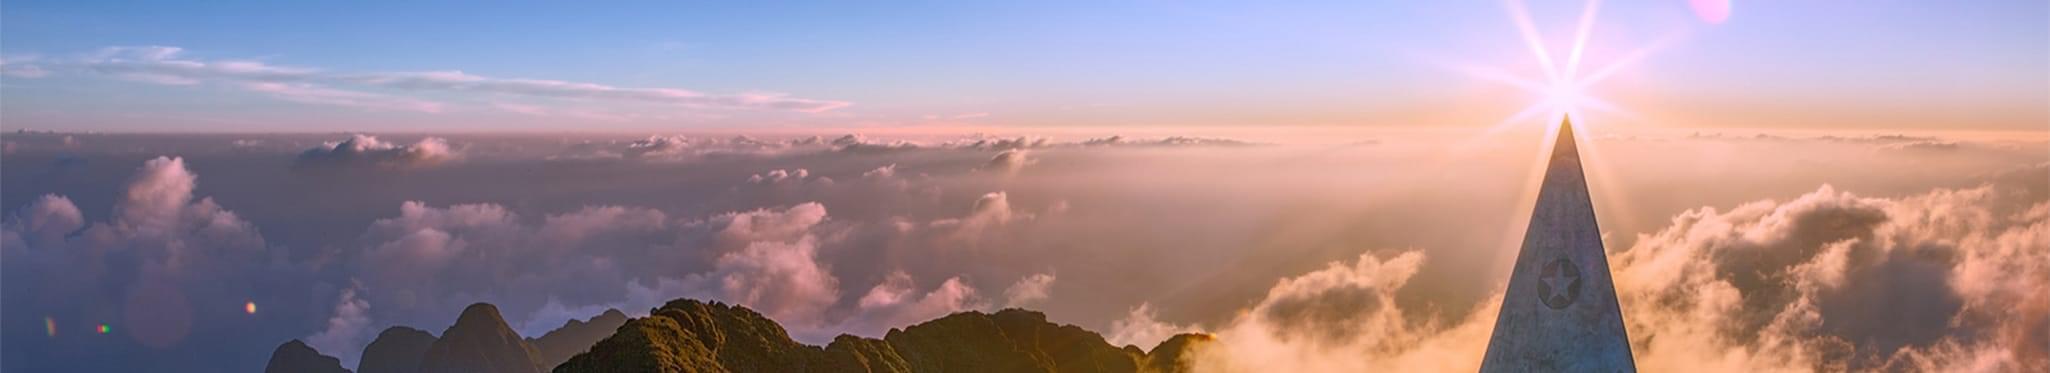 Вершина Индокитая: <br>Ханой, Лао Кай, Сапа, г. Фансипан, Халонг, Ханой